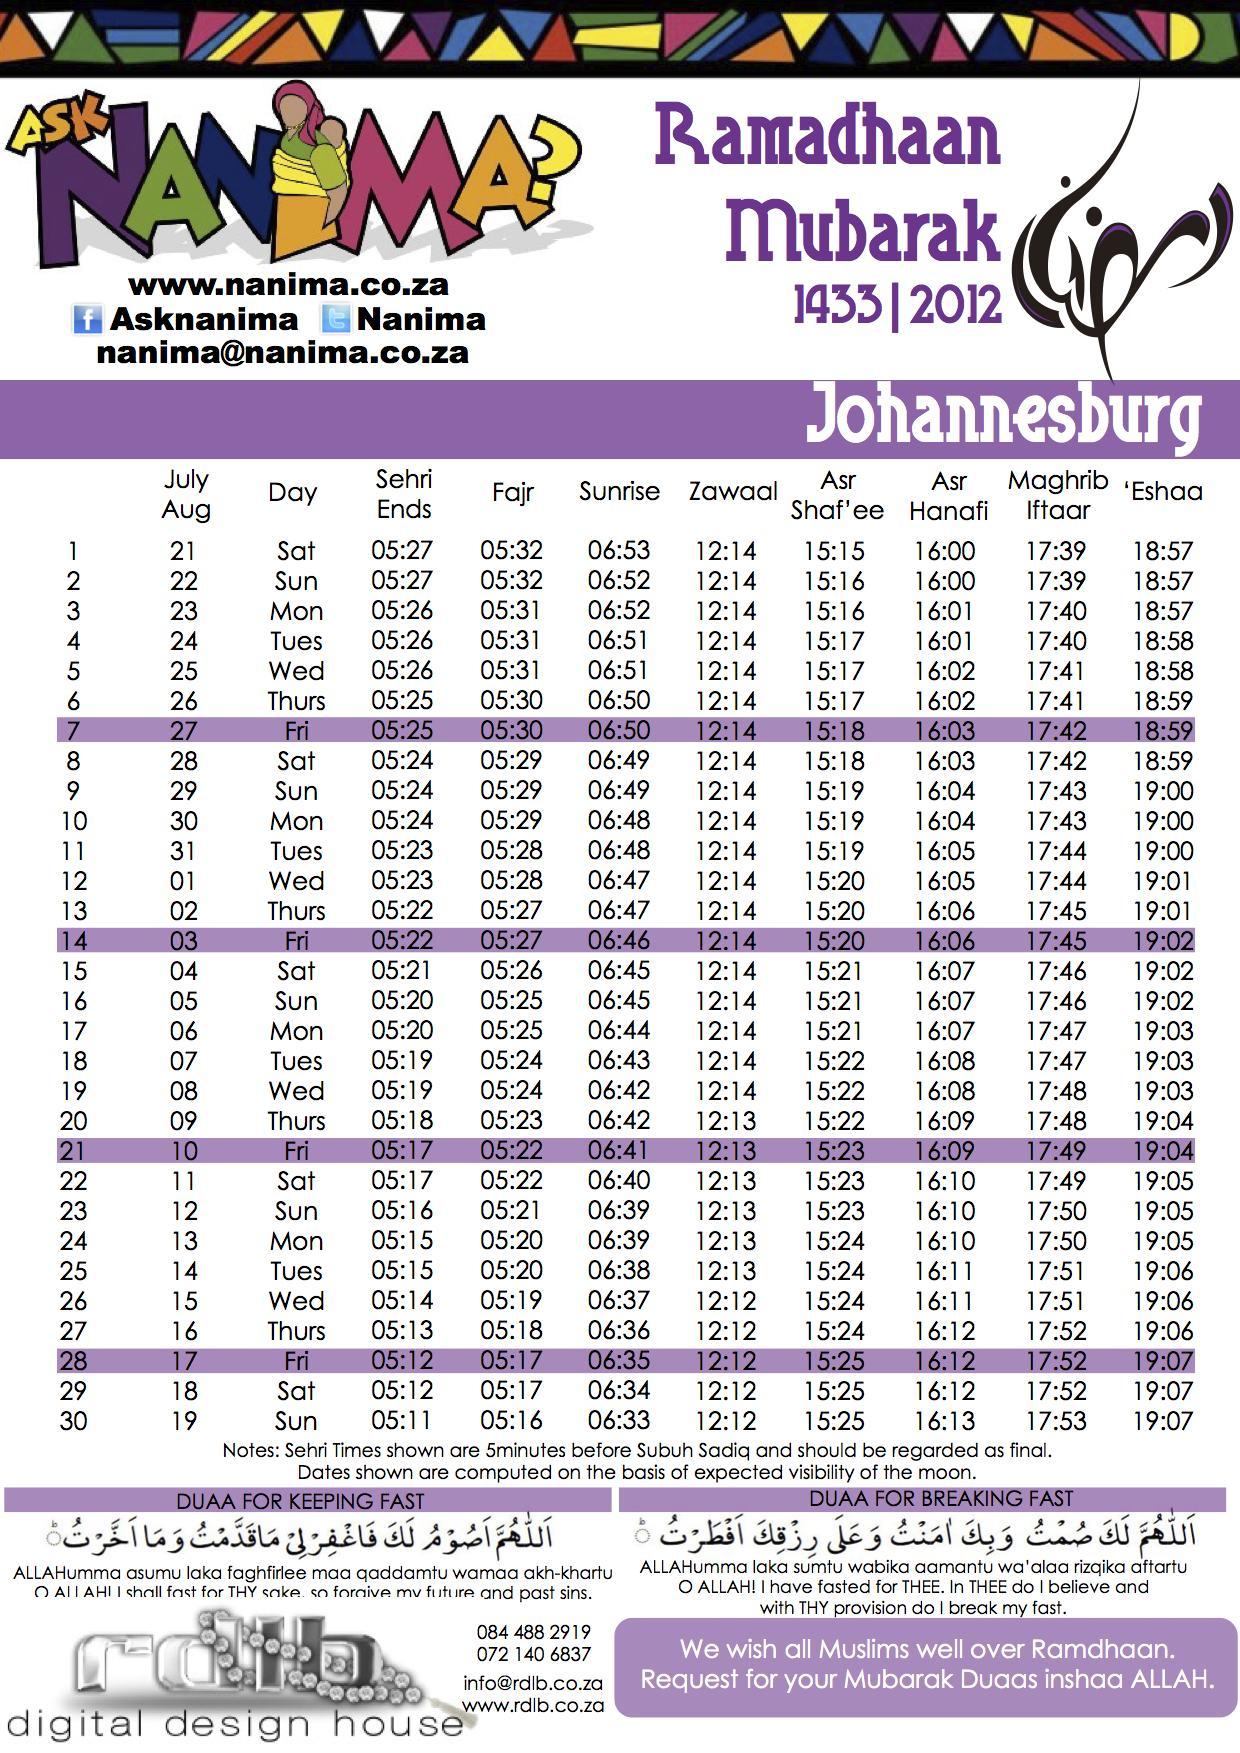 Johannesburg Ramadan 1433 Timetable – 2012